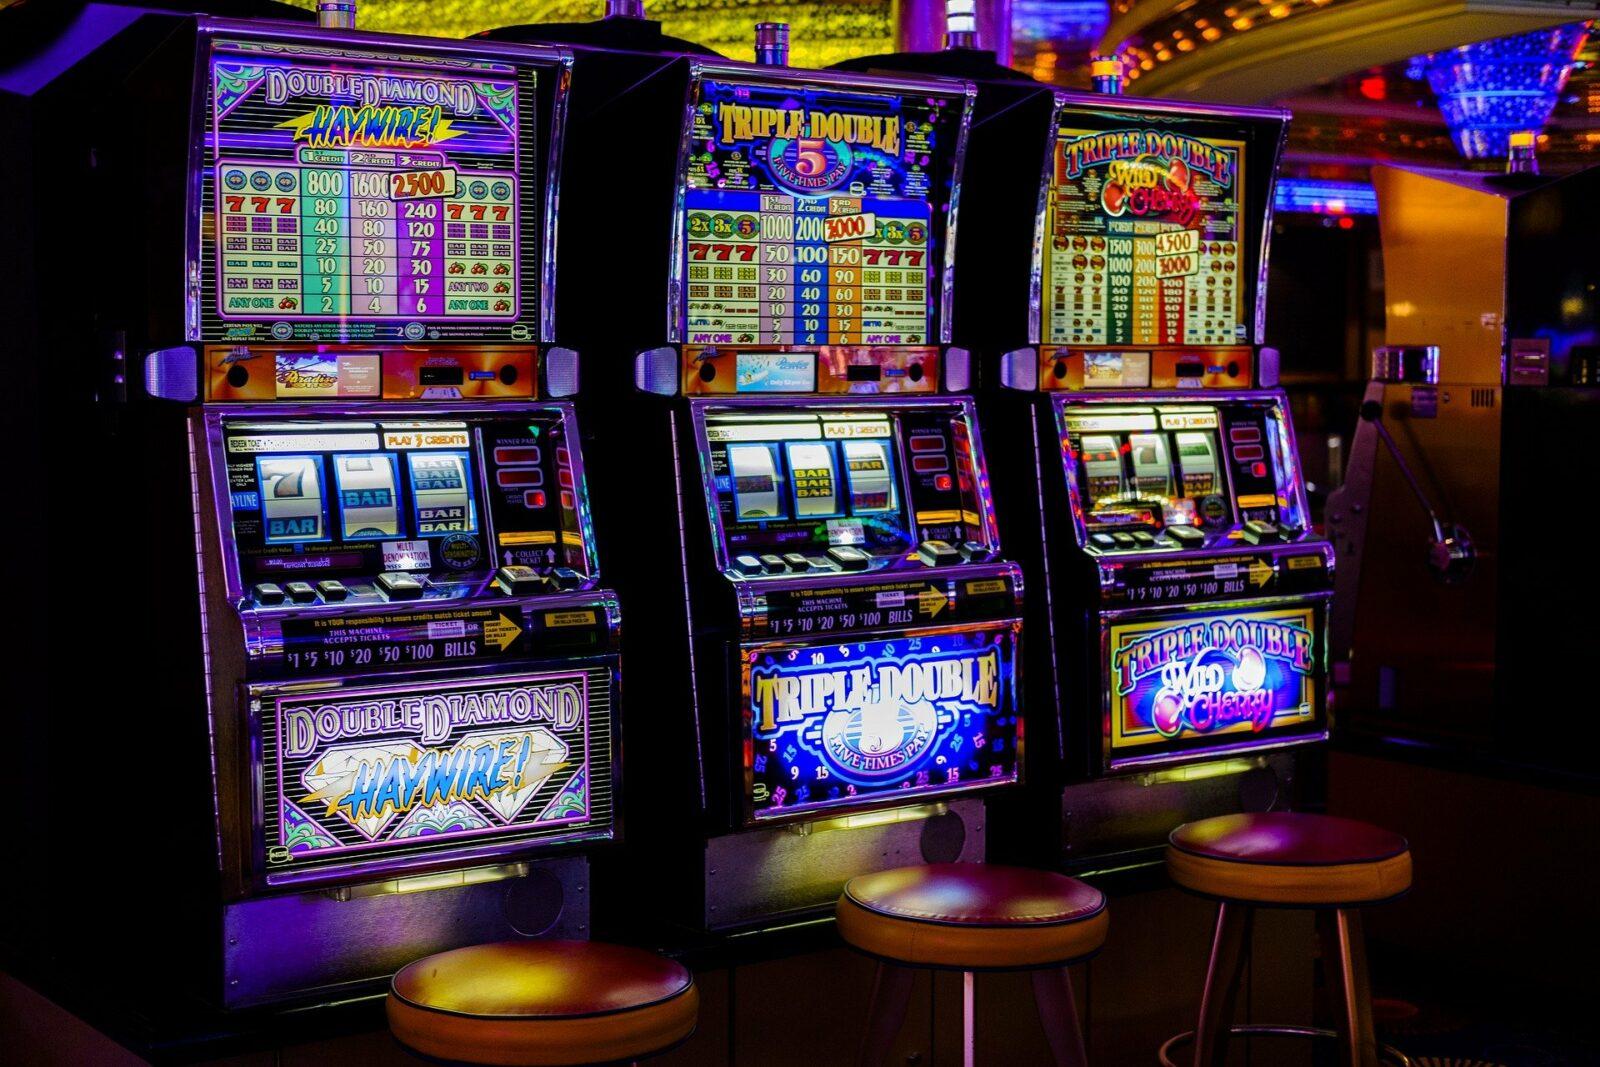 casino bandit manchot